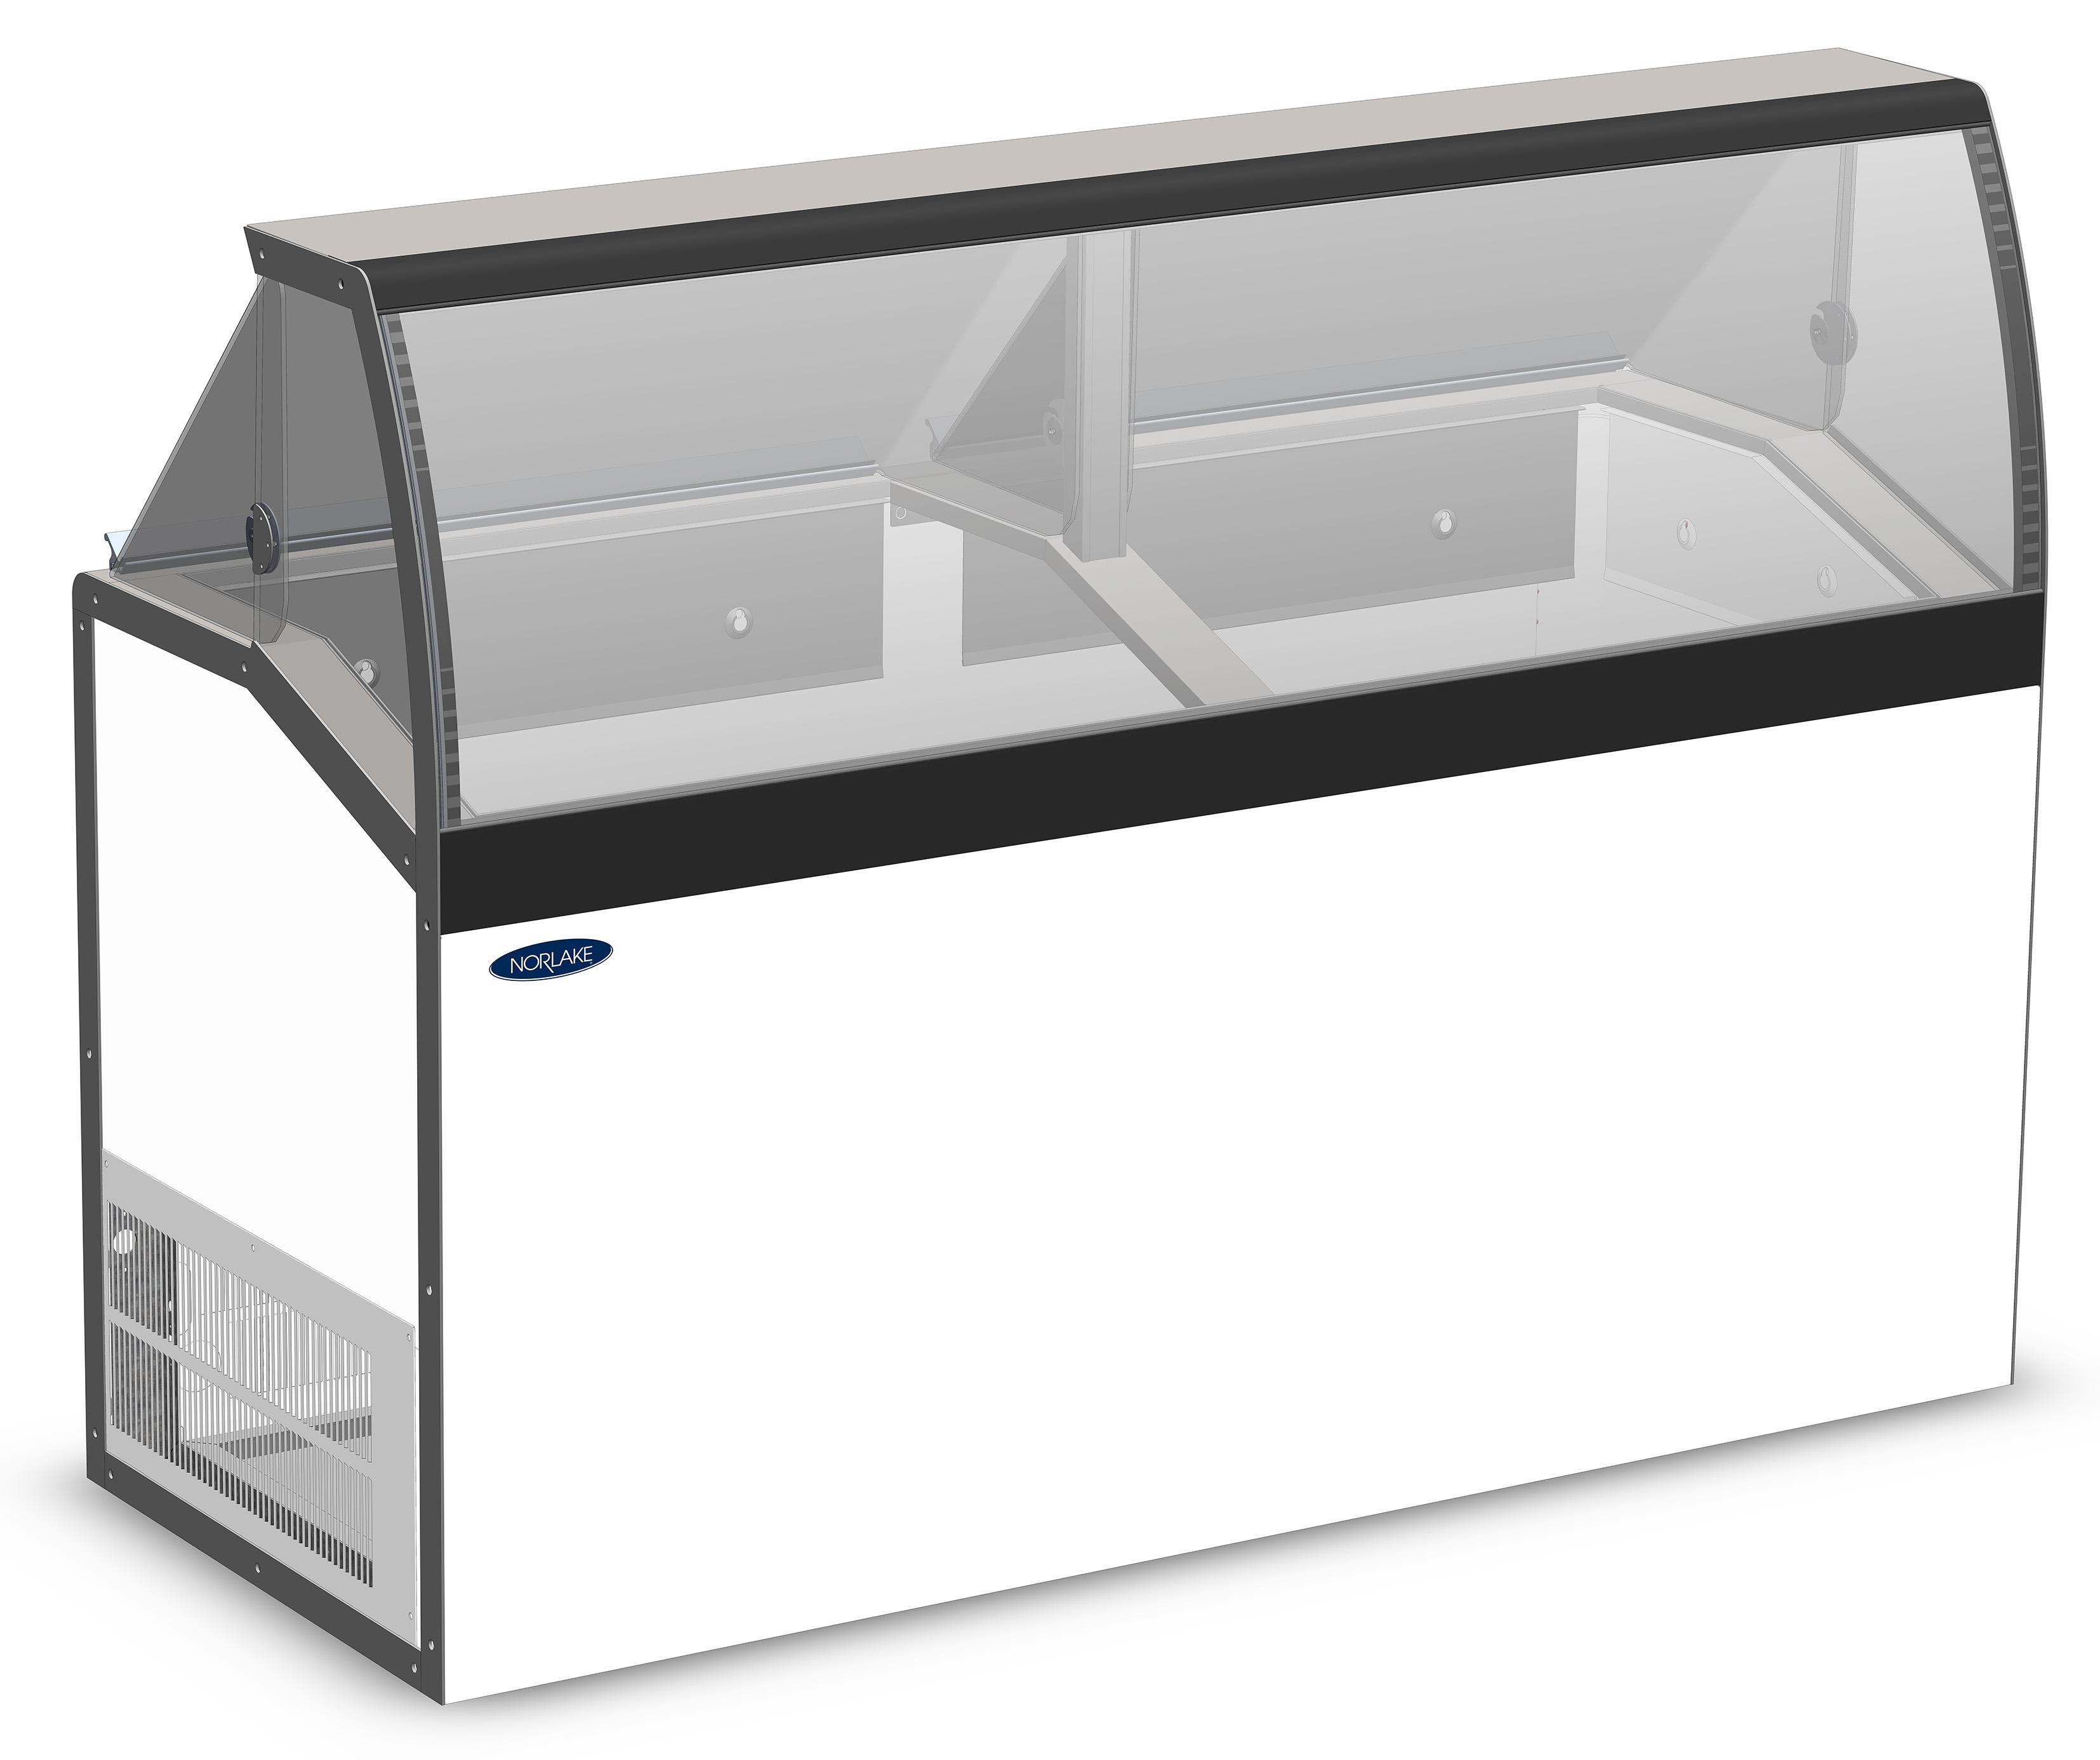 Nor-Lake HF160WWG/0LCG low viewing / curved glass , display freezers